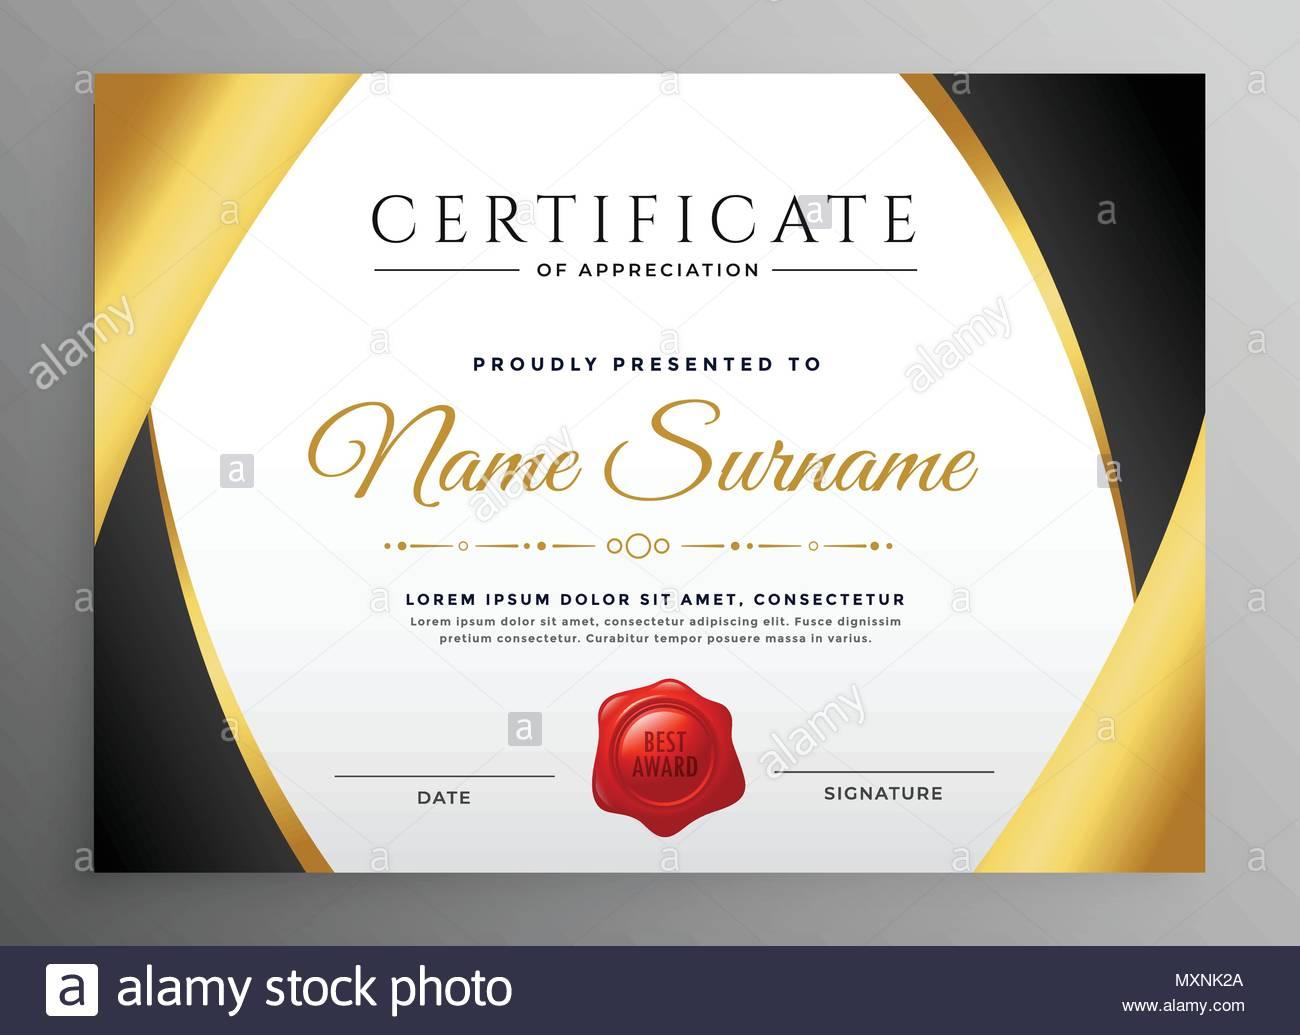 Premium Certificate Of Appreciation Template Stock Vector Art